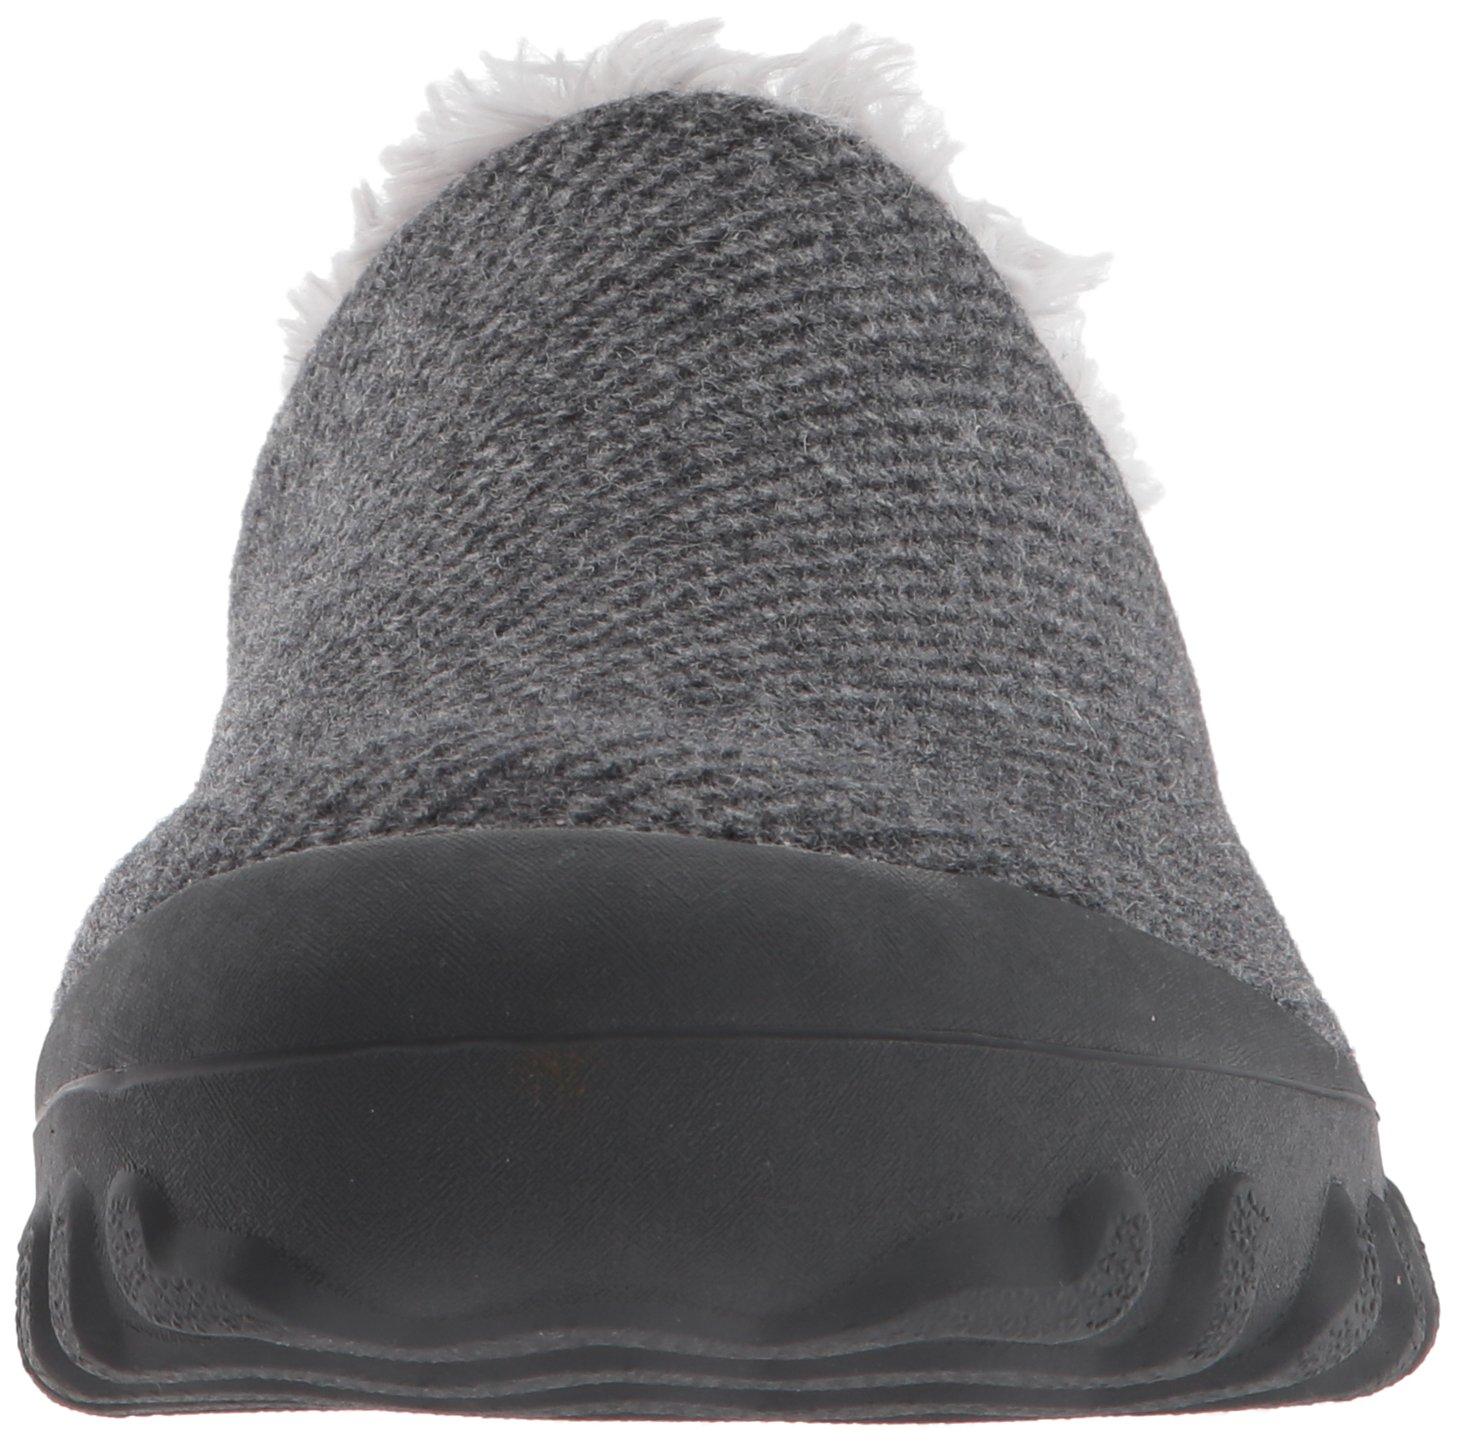 Bogs Women's Bmoc Slip on Wool Snow Boot B01N5QEY2L 7 B(M) US|Charcoal